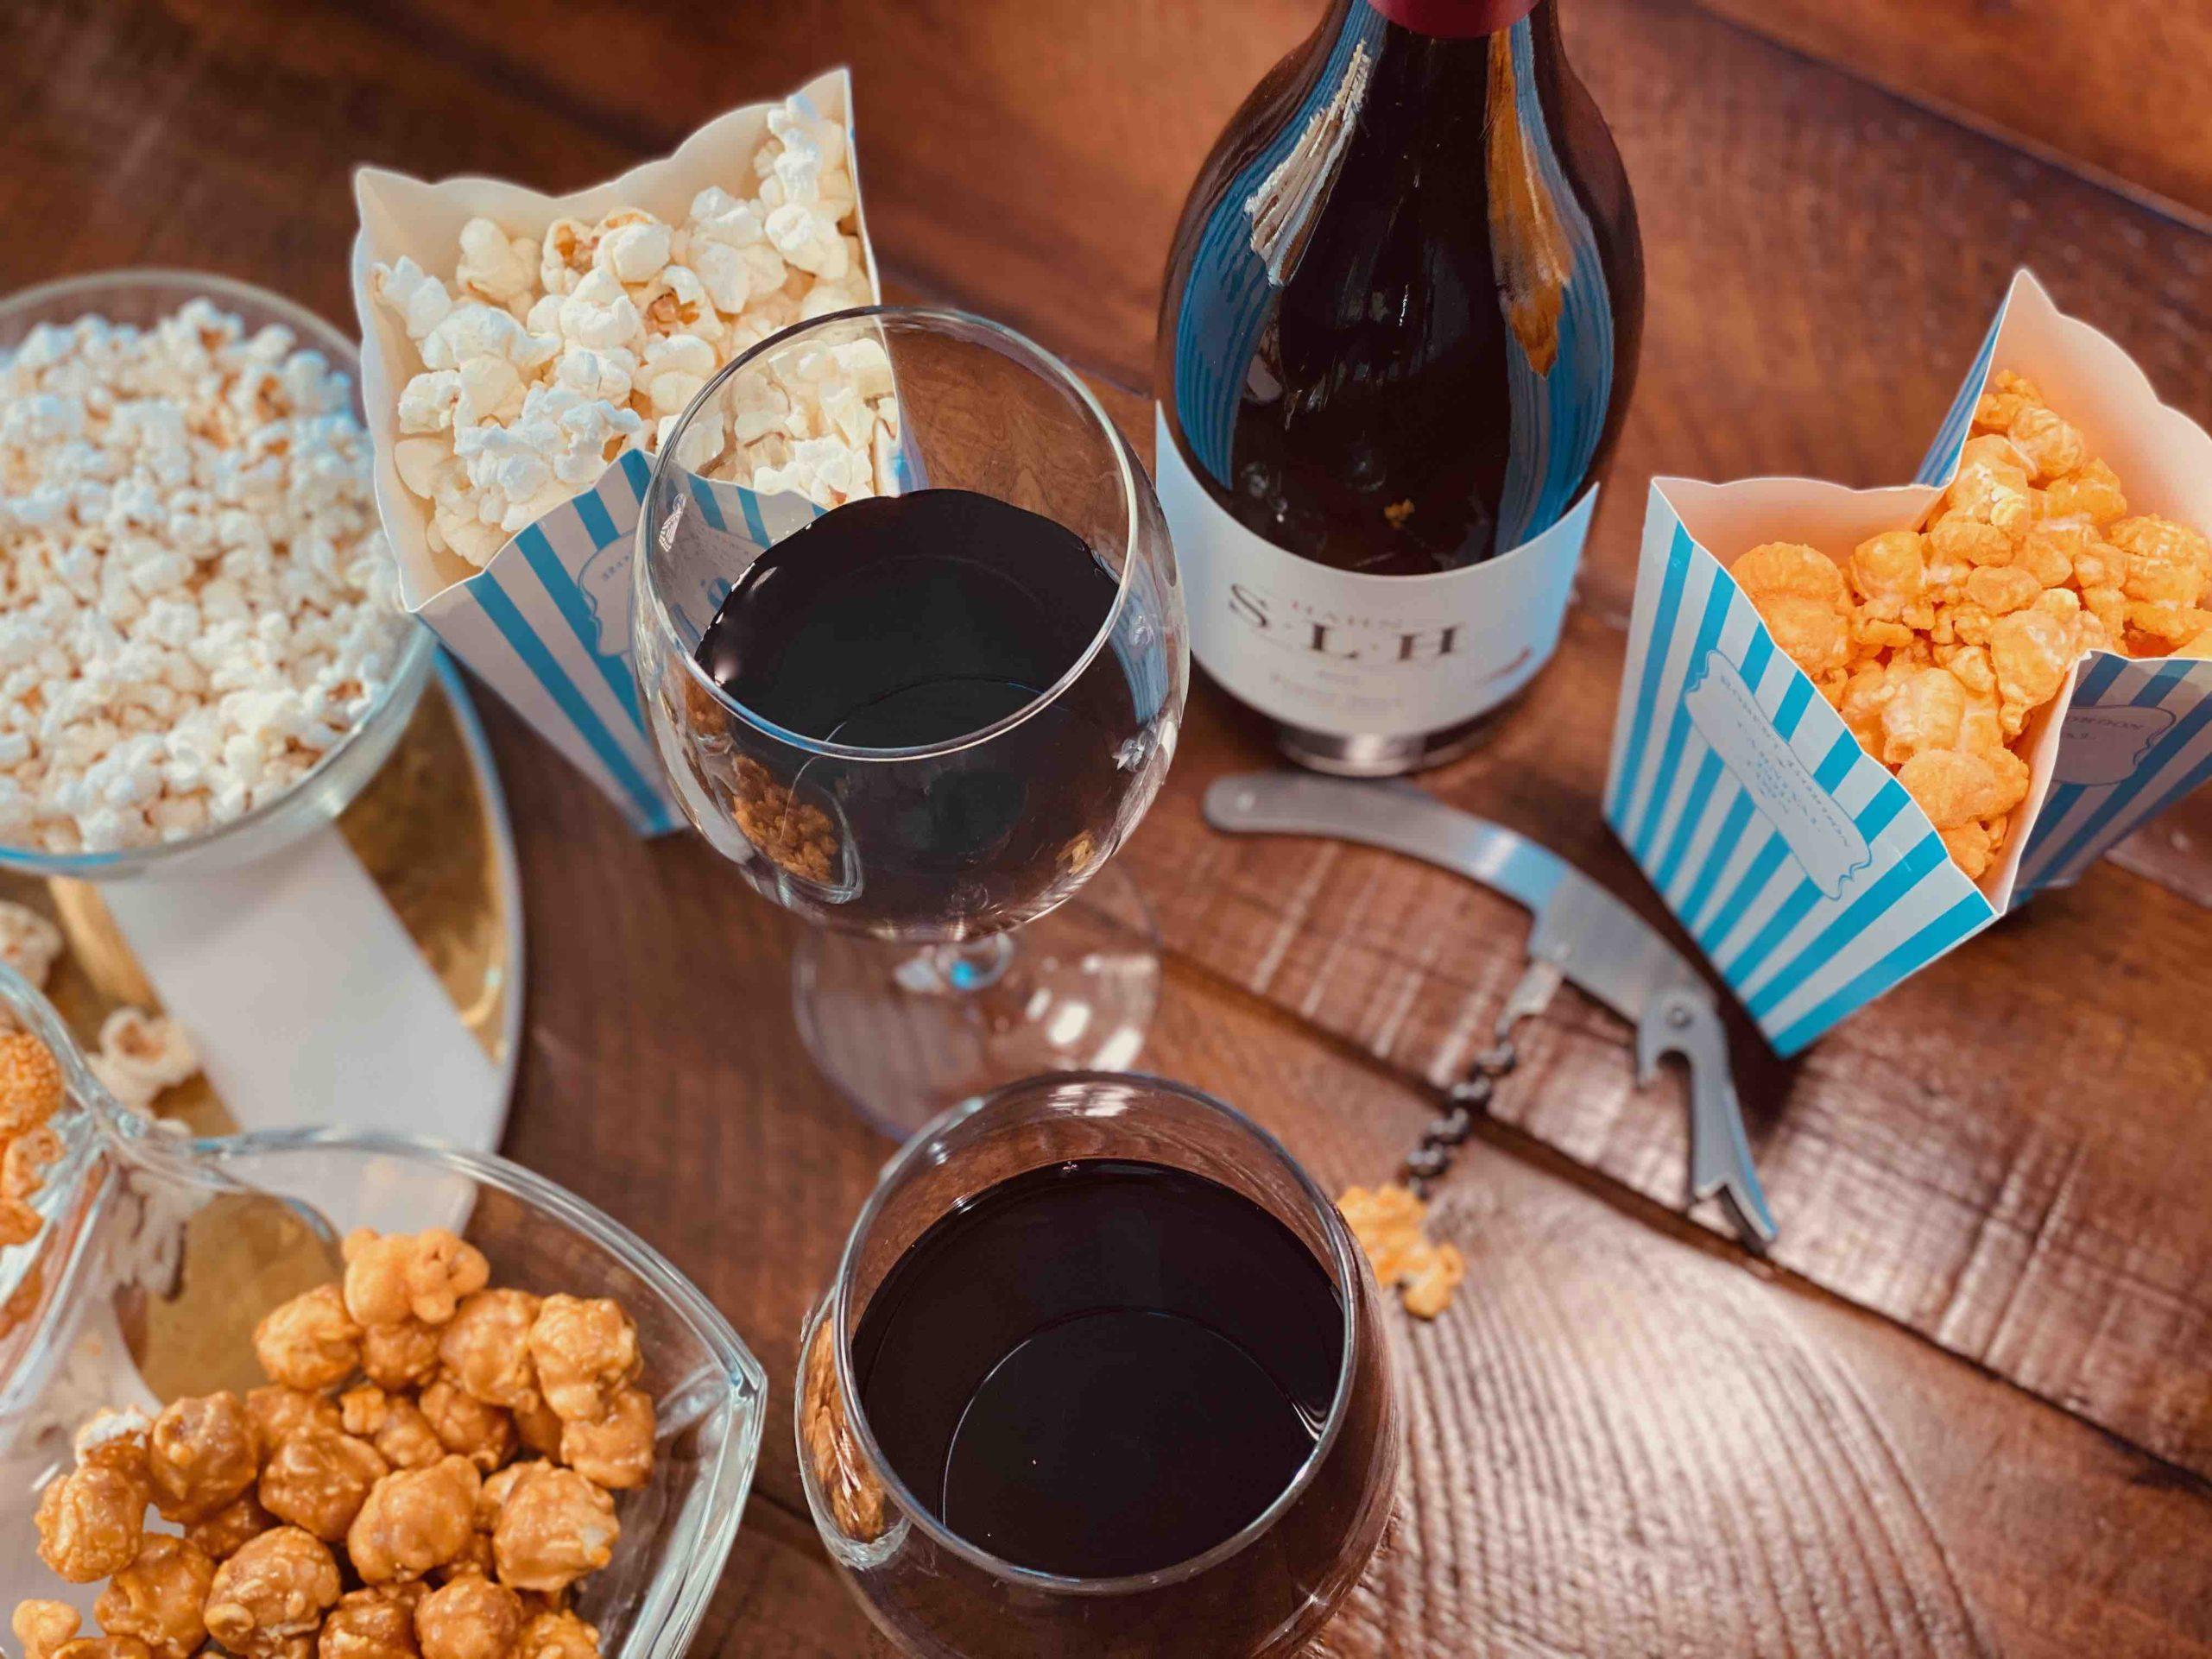 Best Wine And Popcorn Pairings For Your Next Binge-Watching Night